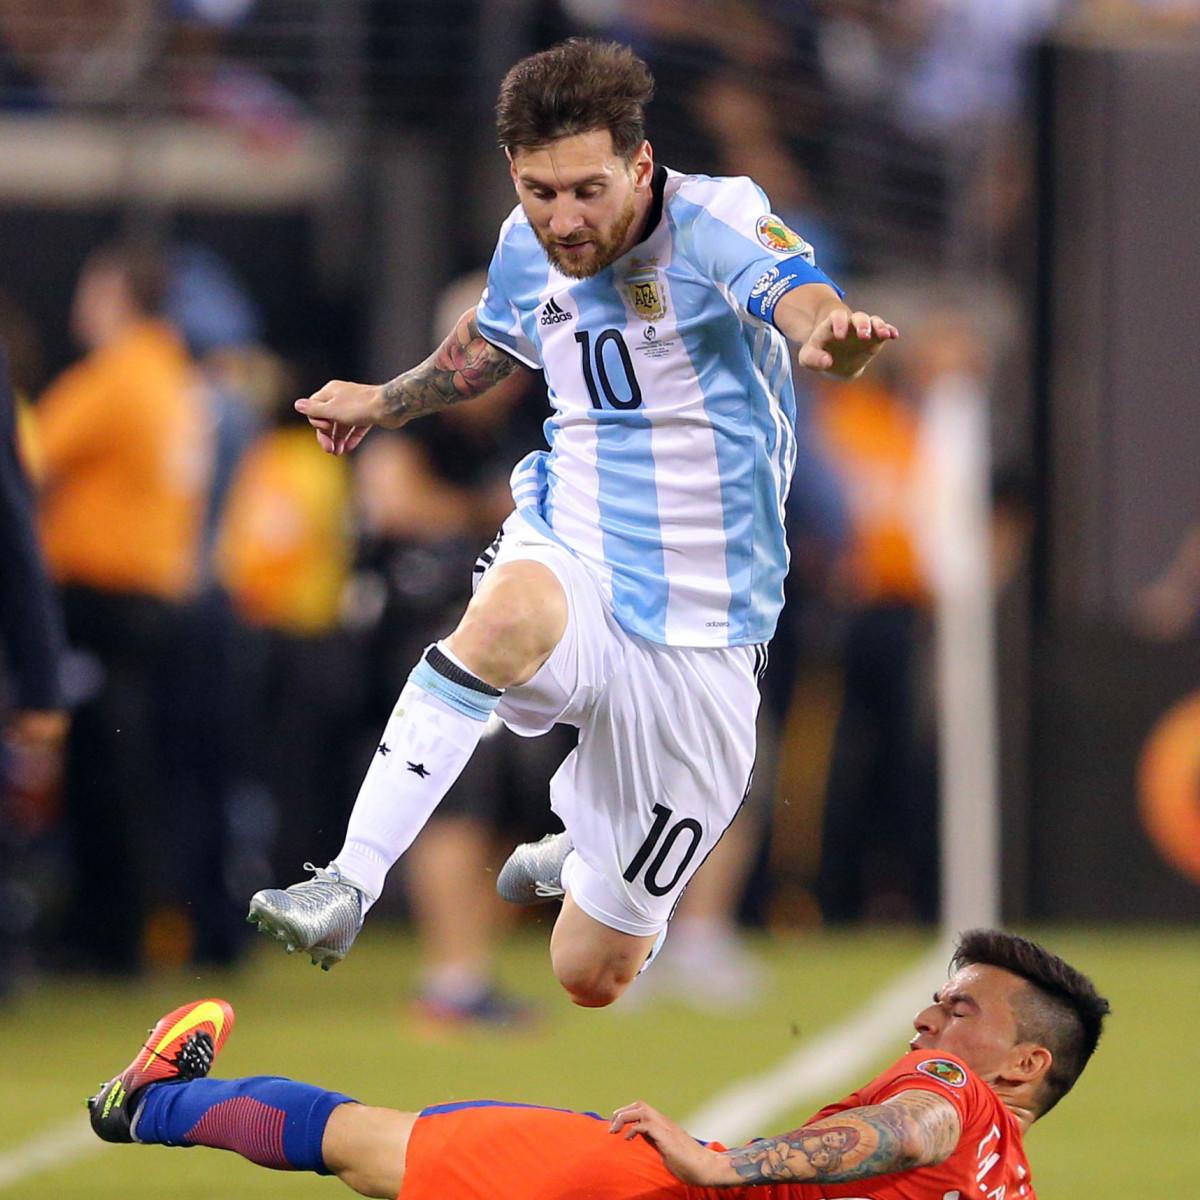 Brazil vs Argentina: Live Updates, Score and Reaction | Bleacher